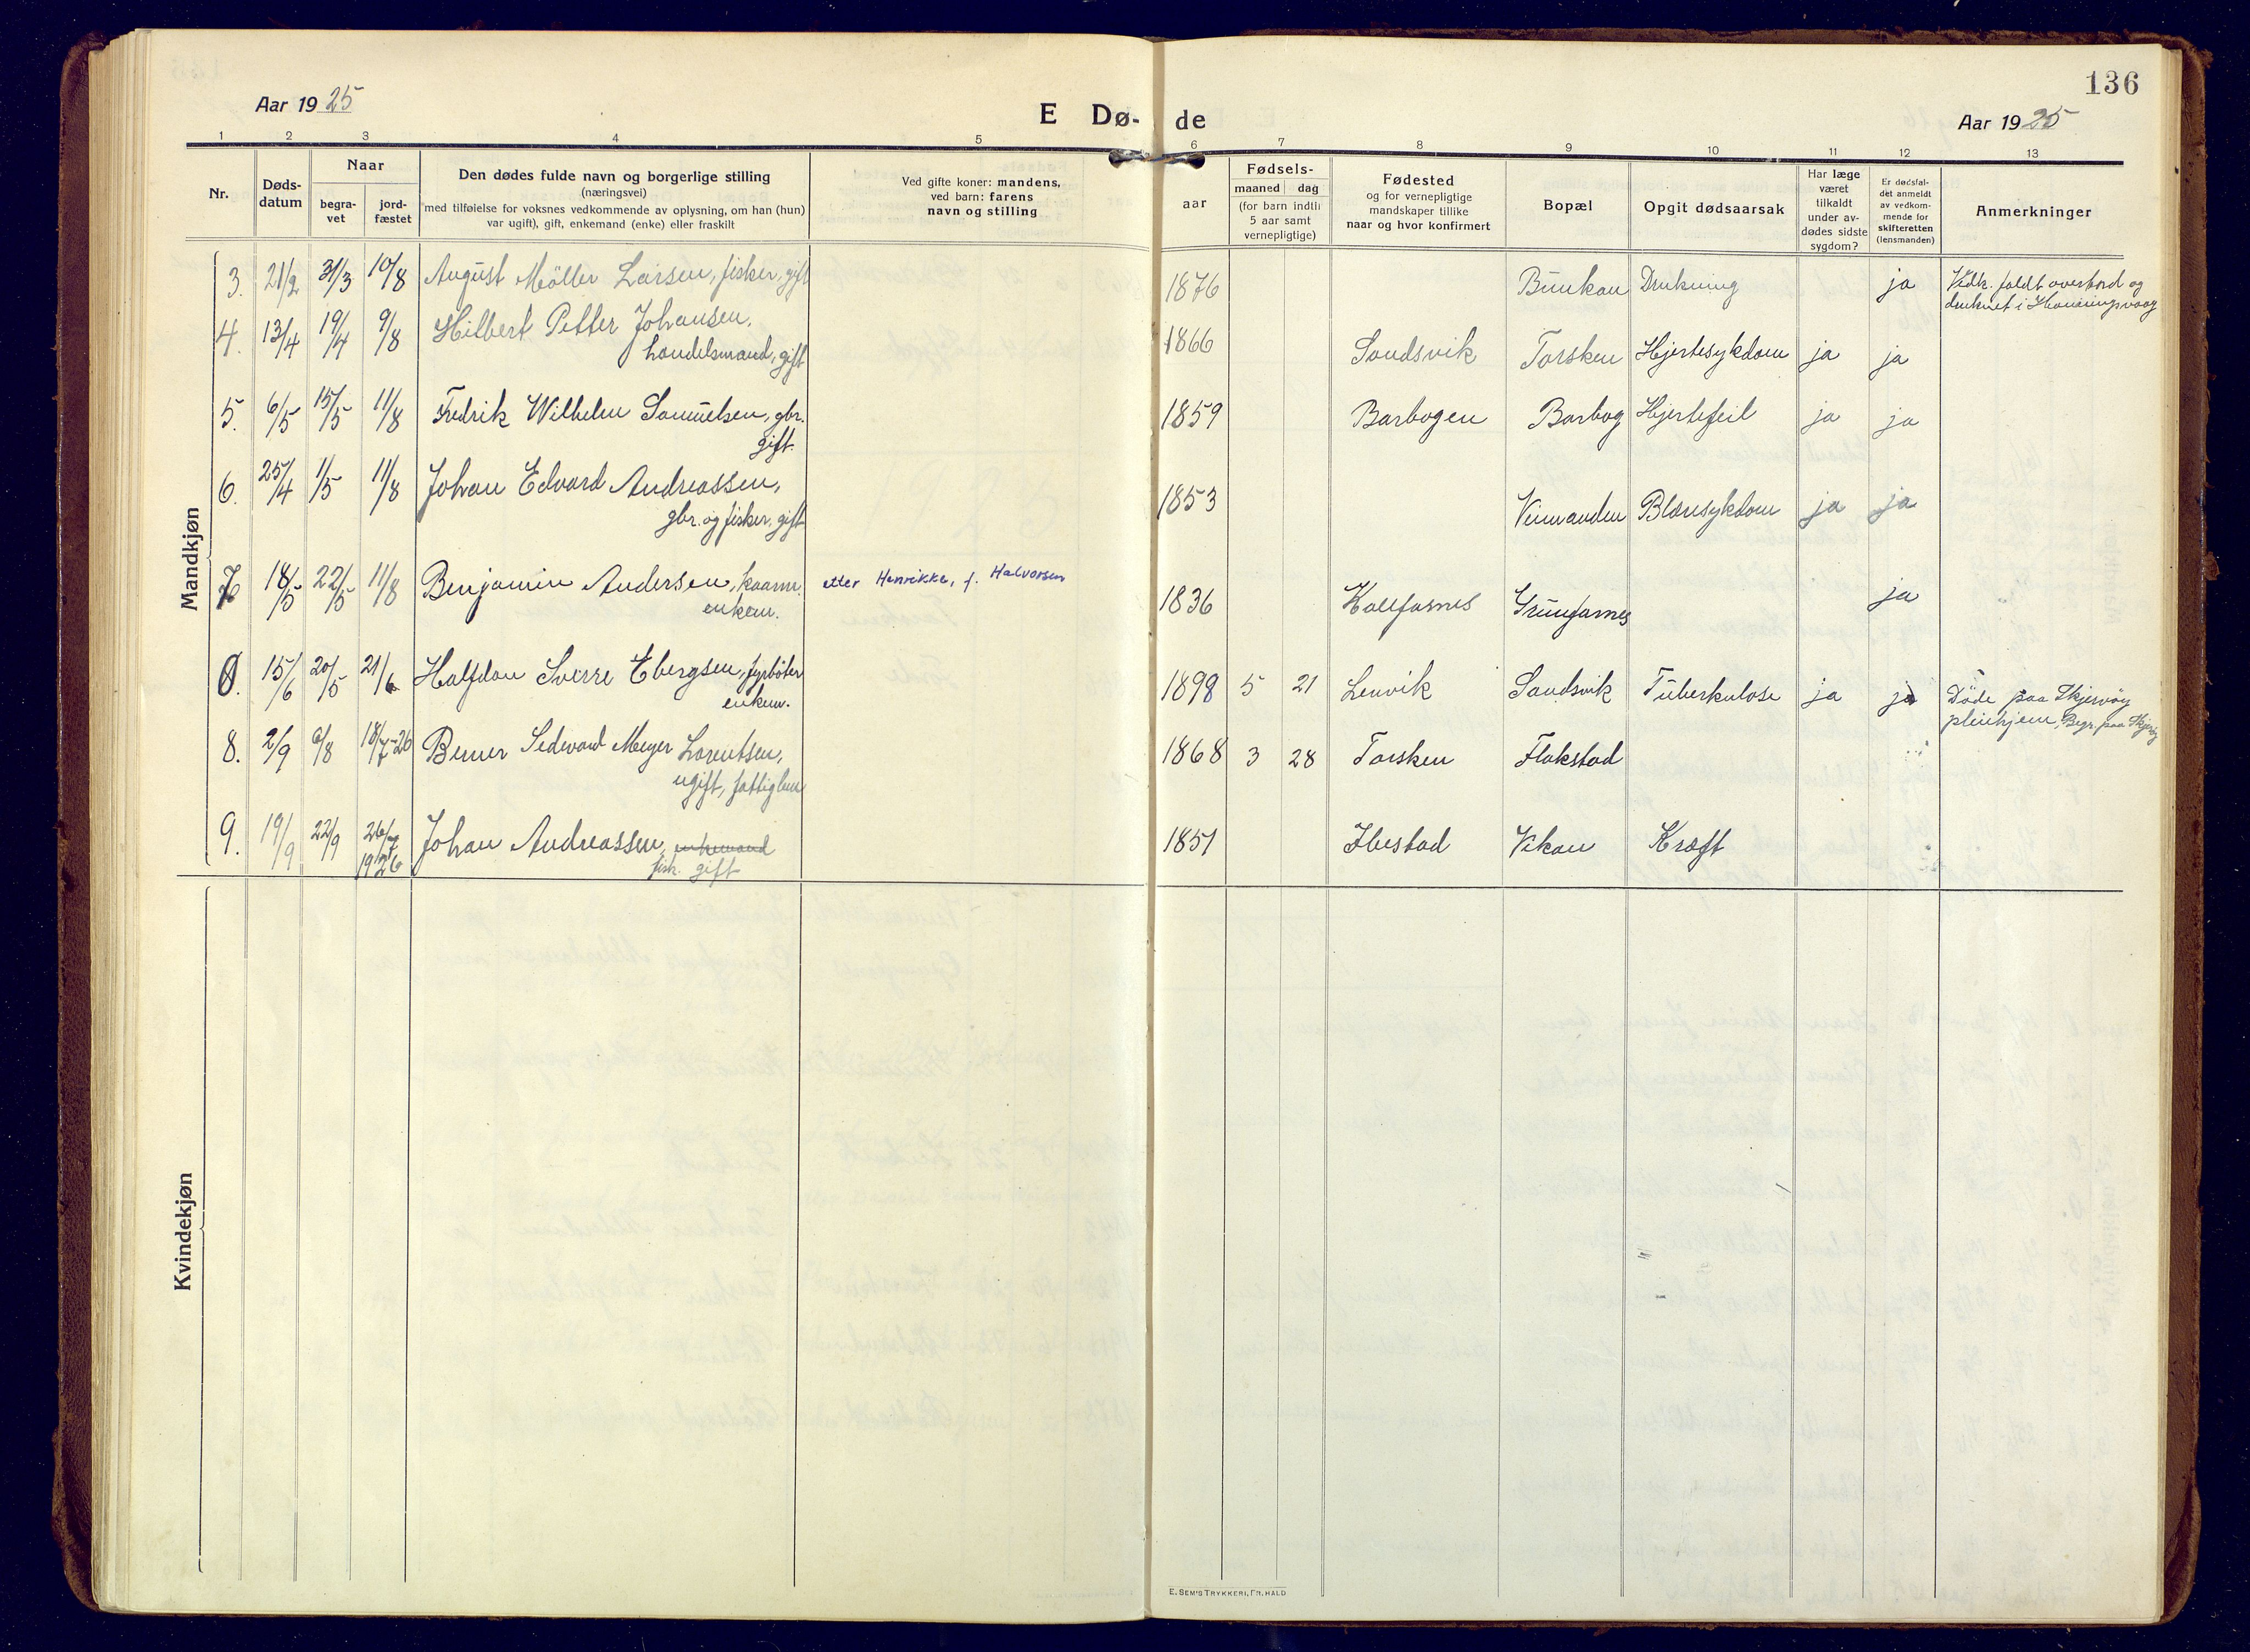 SATØ, Mefjord/Berg sokneprestkontor, G/Ga/Gaa: Ministerialbok nr. 10, 1916-1928, s. 136